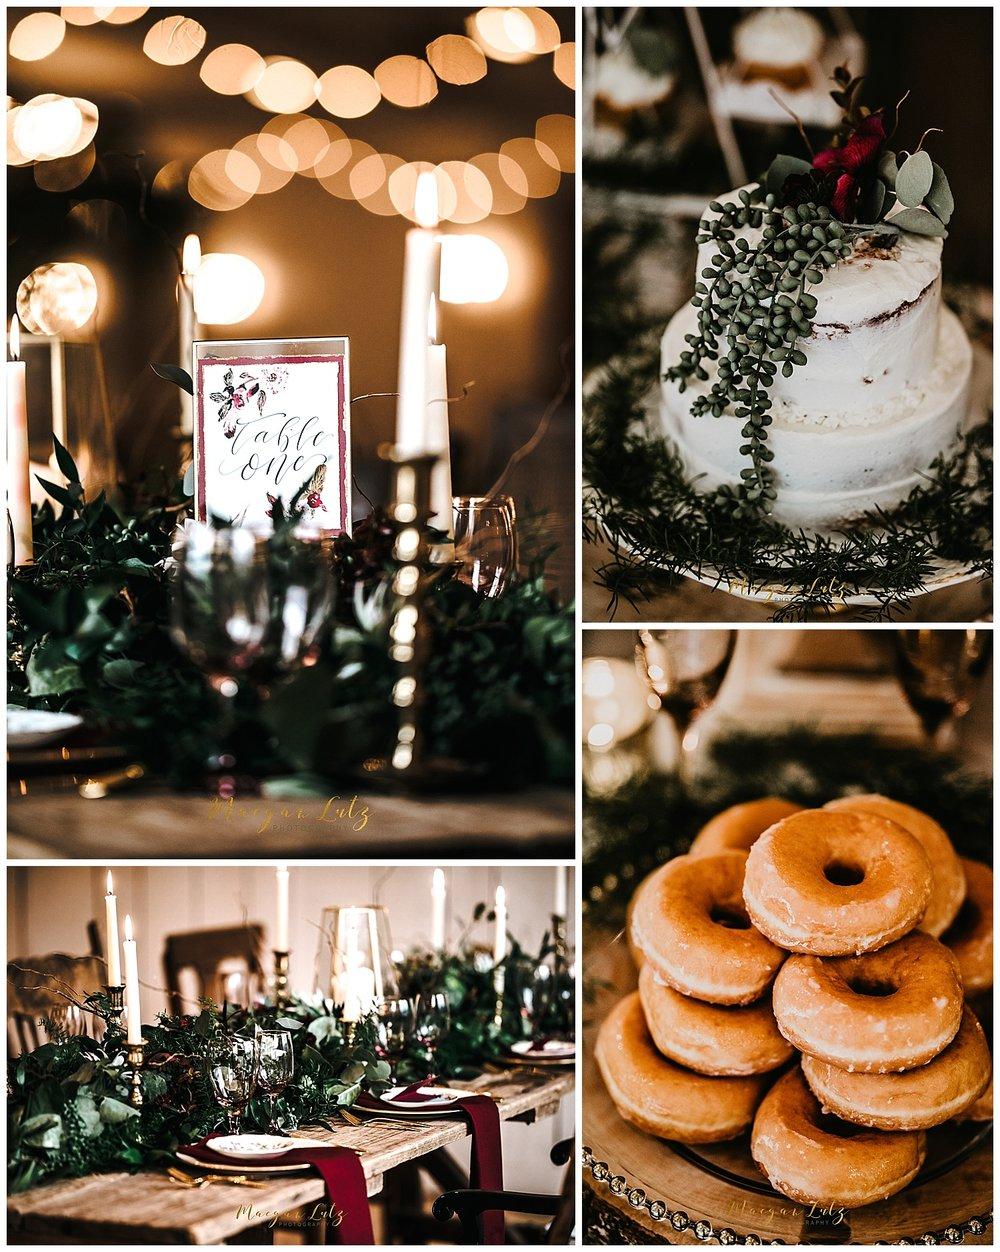 NEPA-wedding-engagement-photographer-whitewoods-weddings-venue-Wapwallopen-PA_0062.jpg